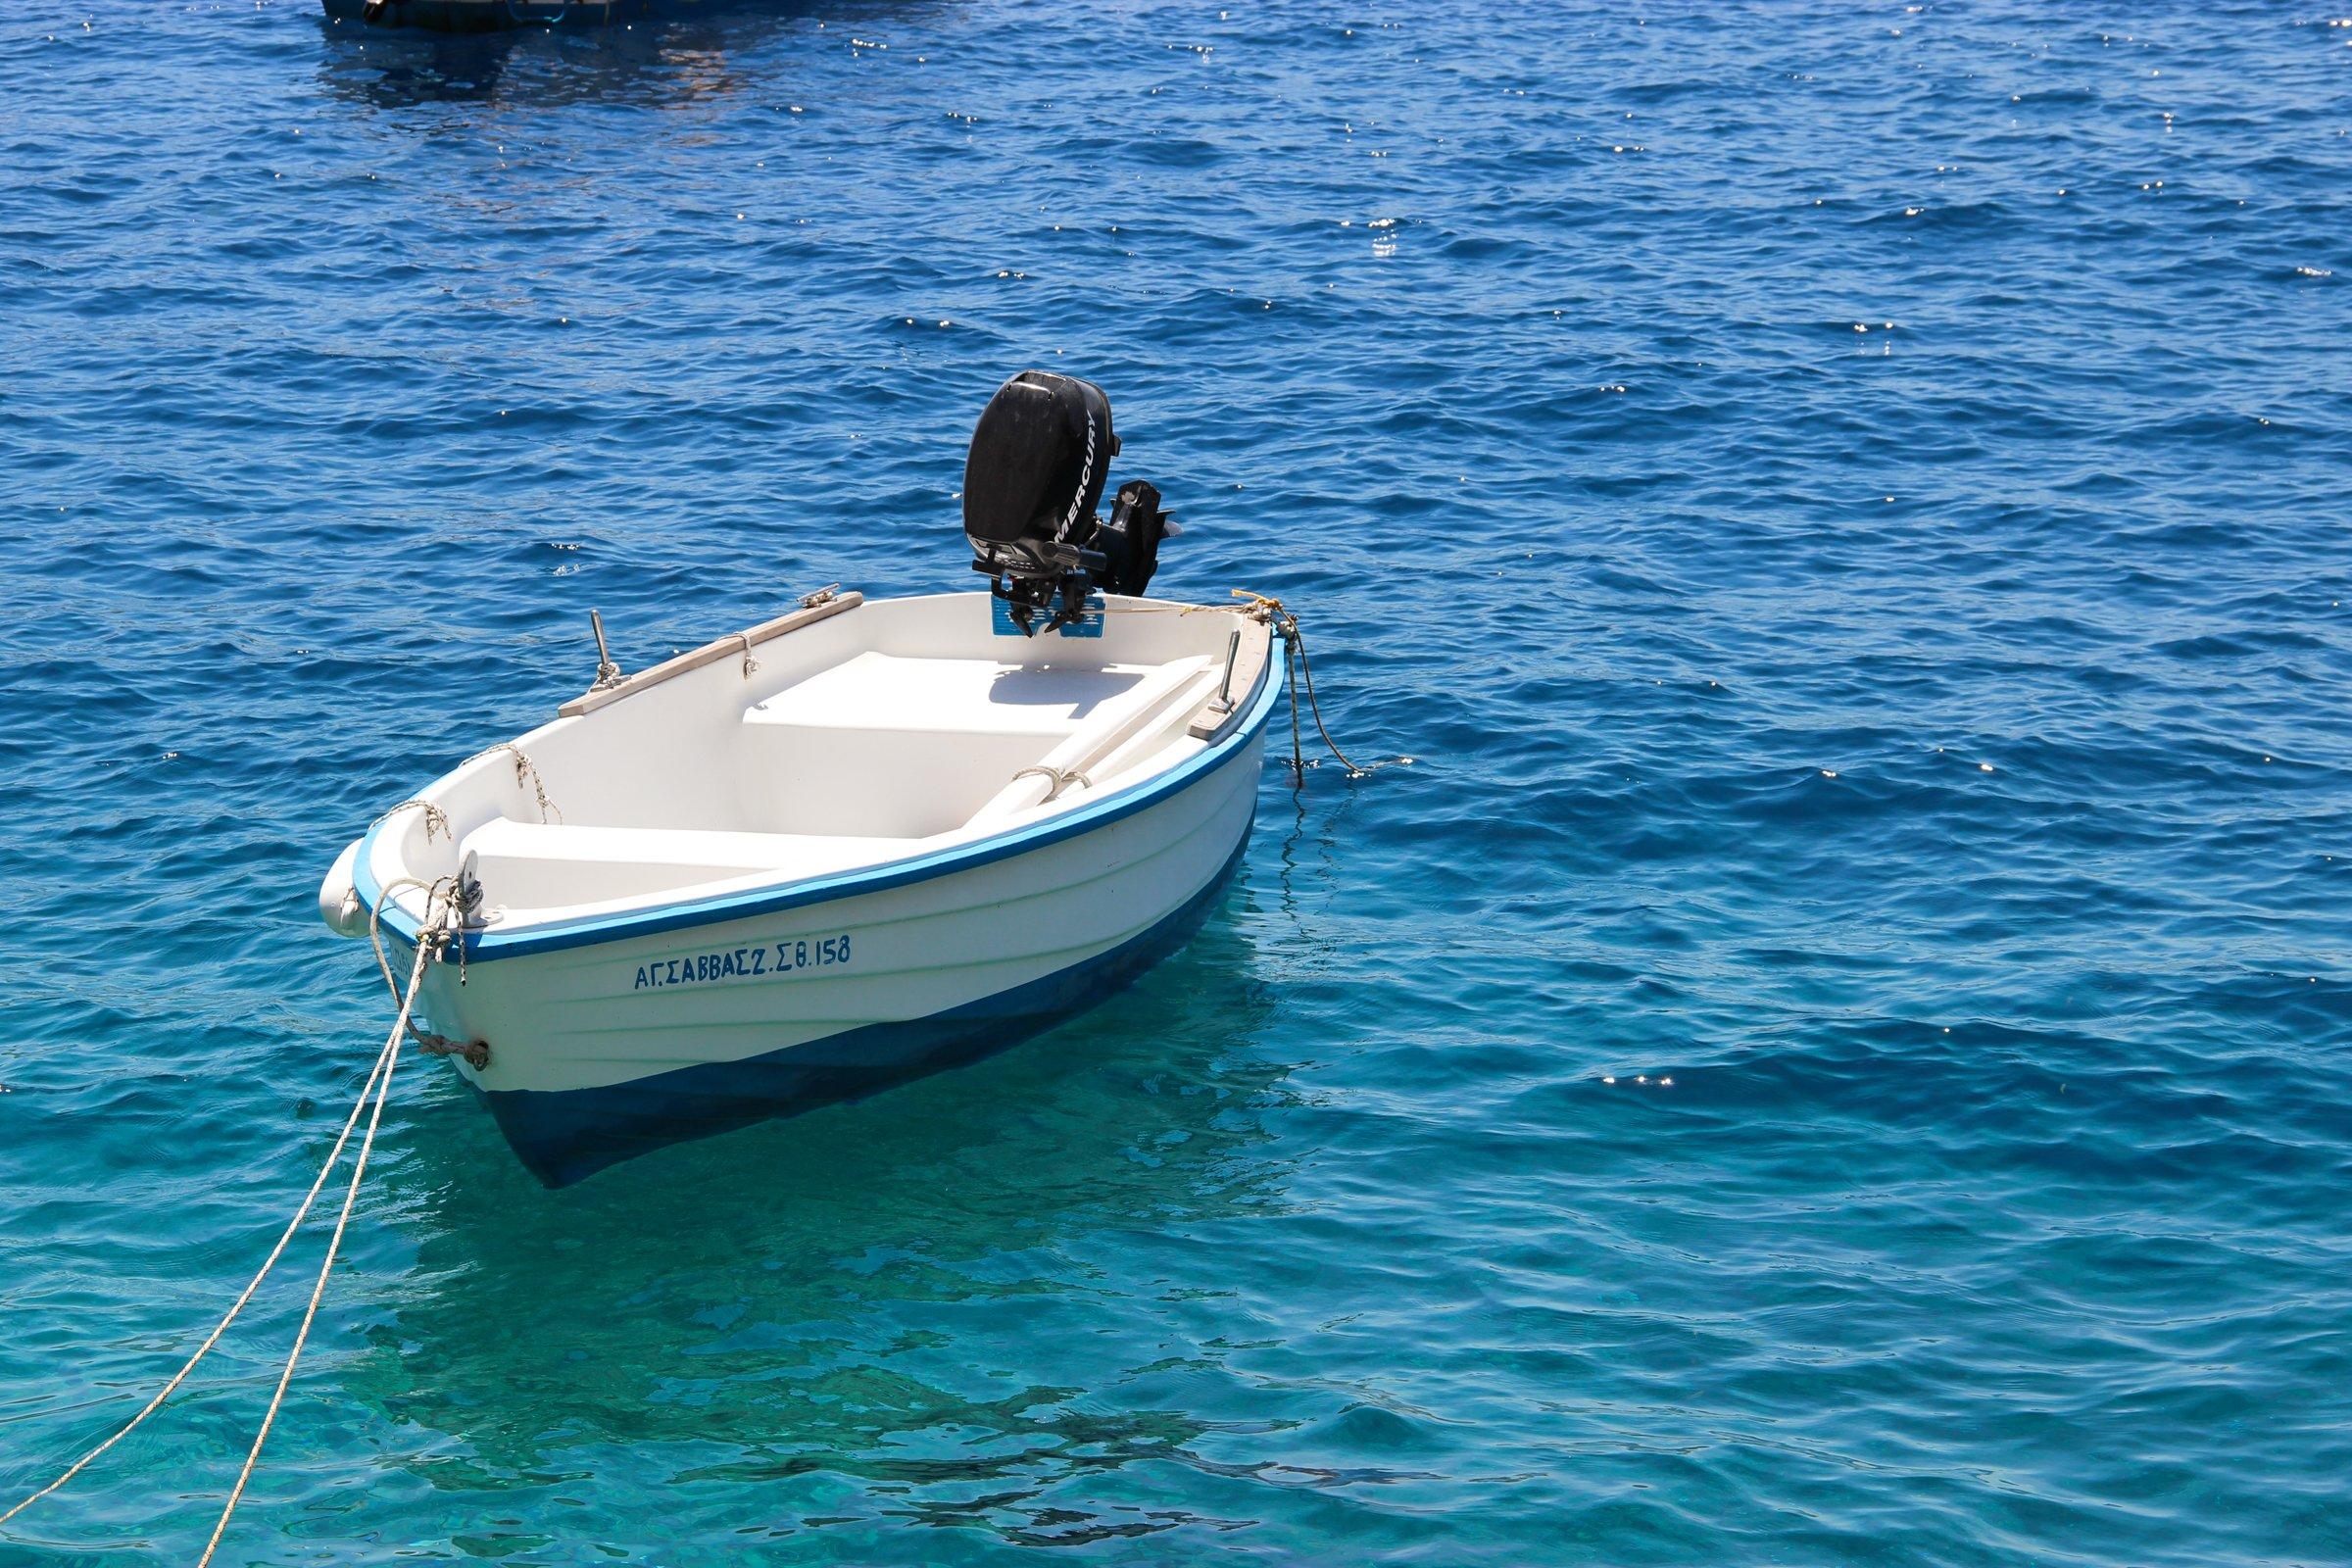 Empty Motorboat On Water